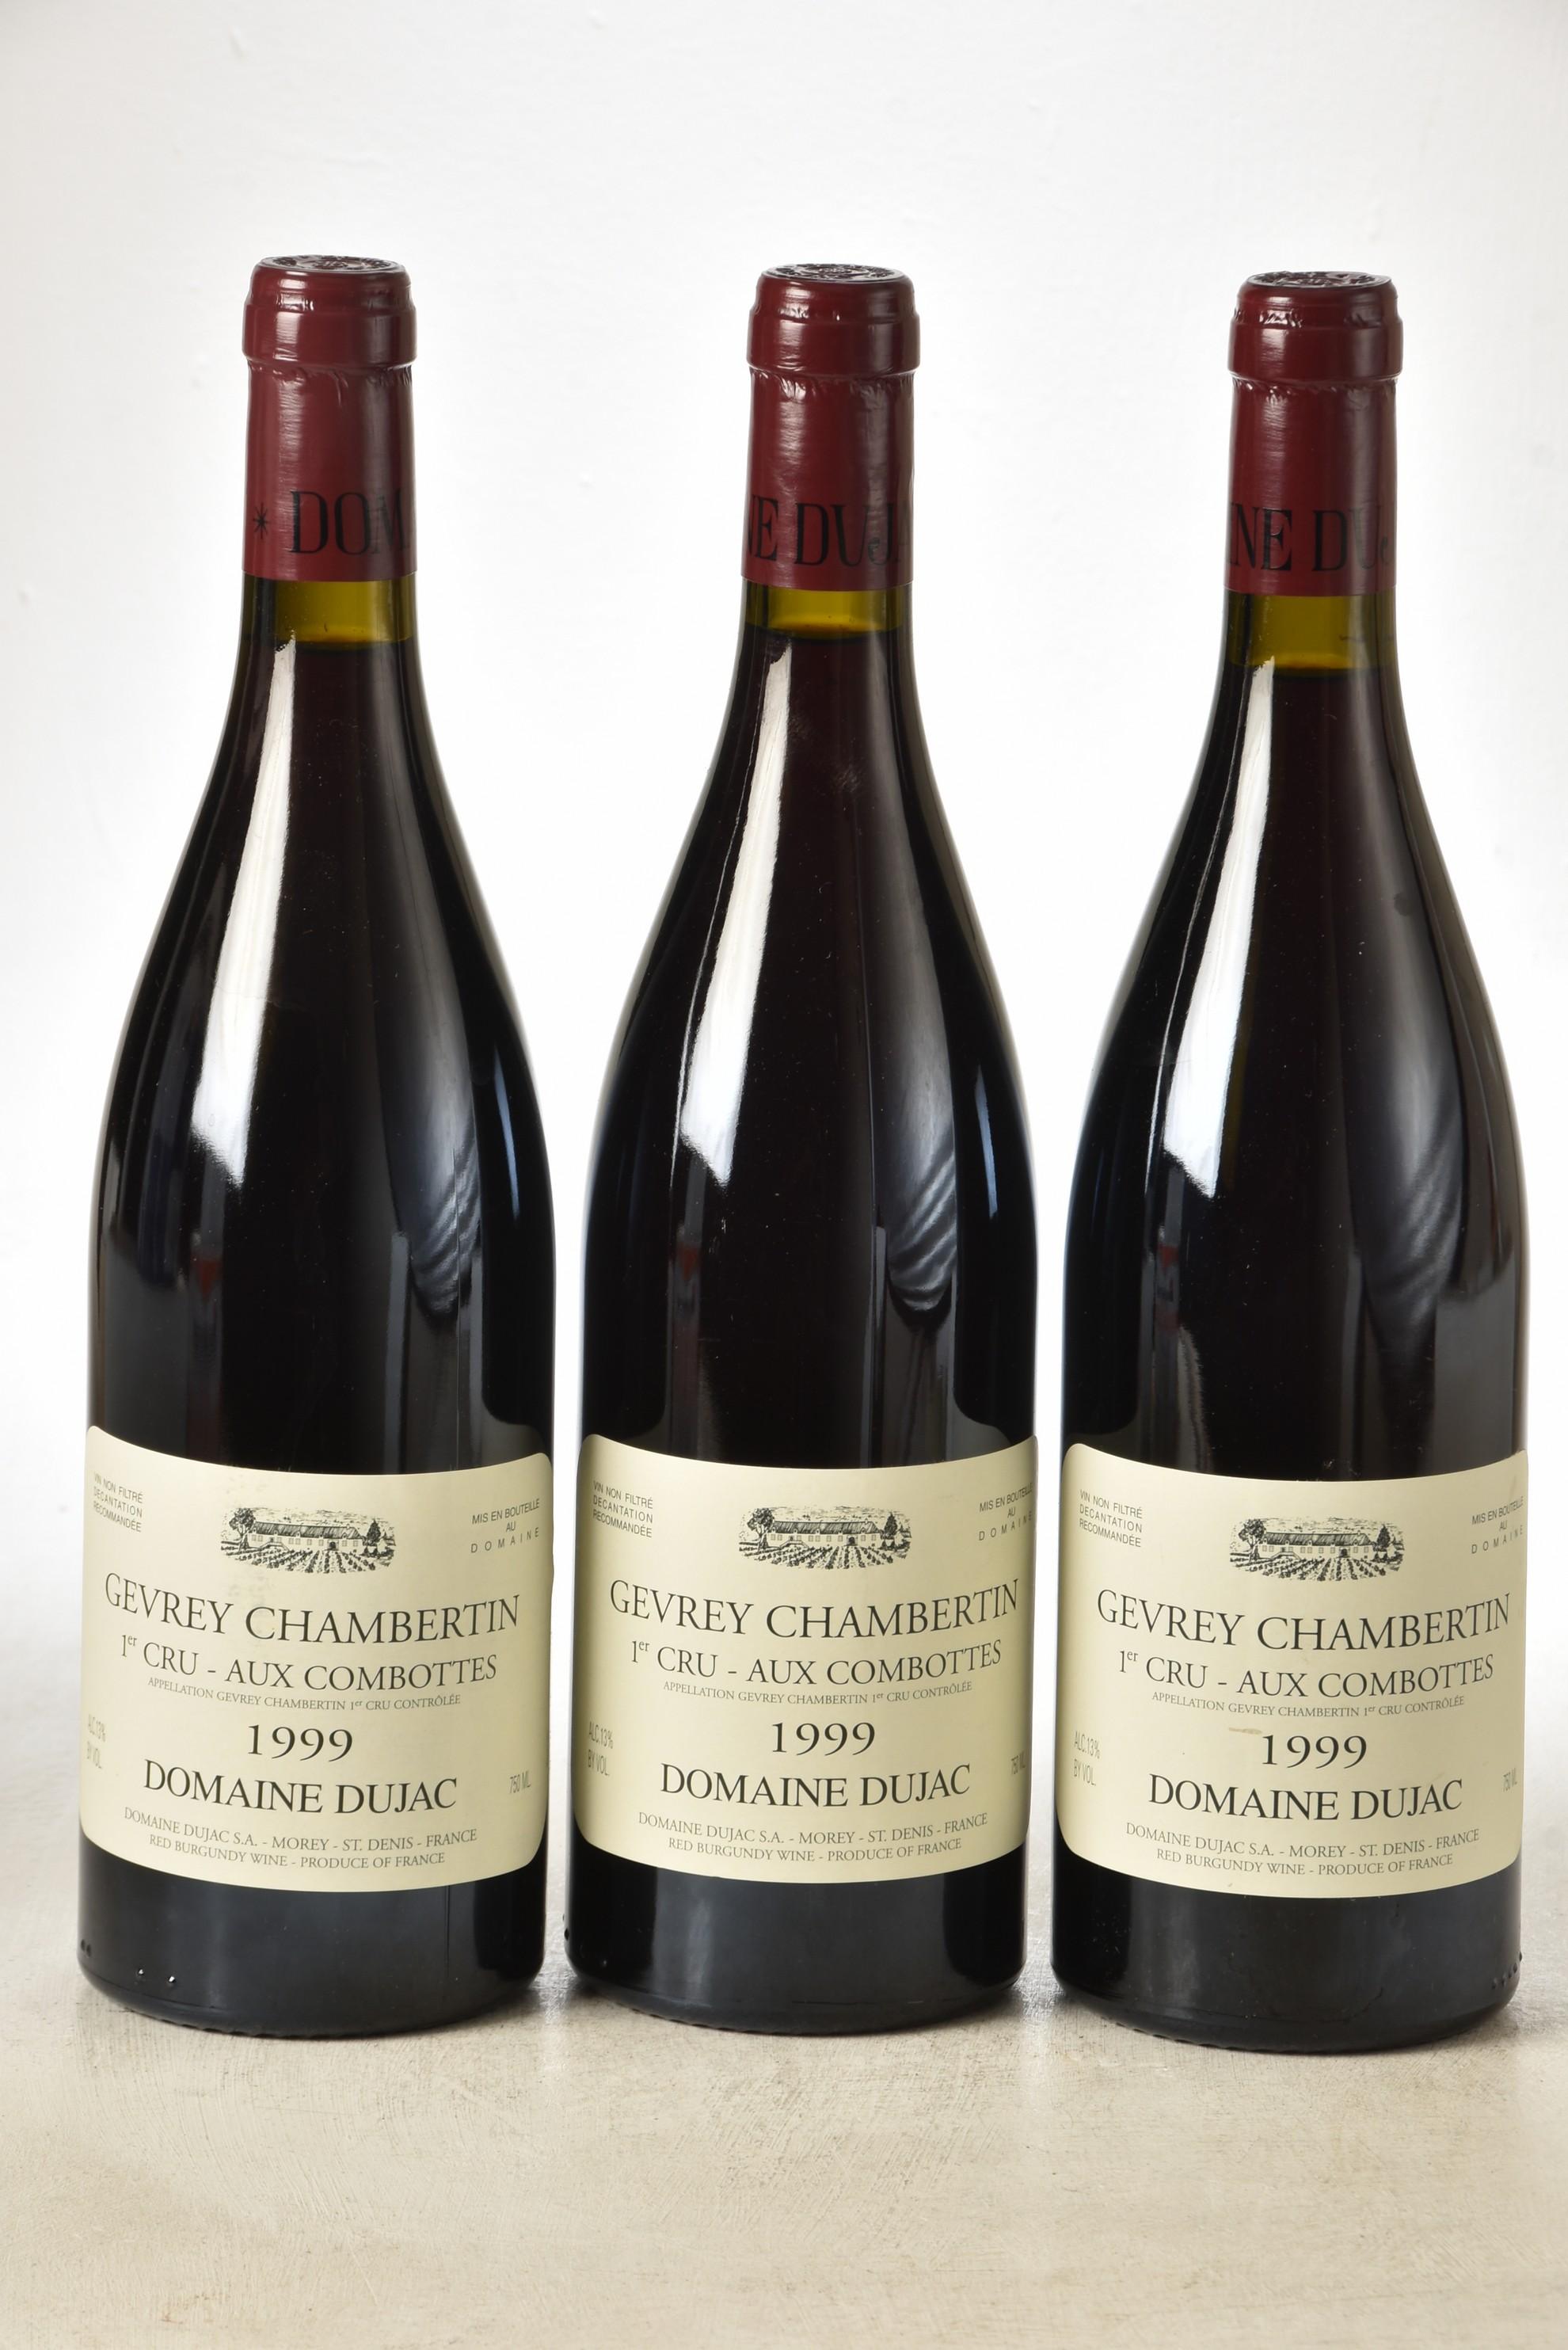 Gevrey-Chambertin 1er Cru Aux Combottes 1999 Domaine Dujac 3 bts